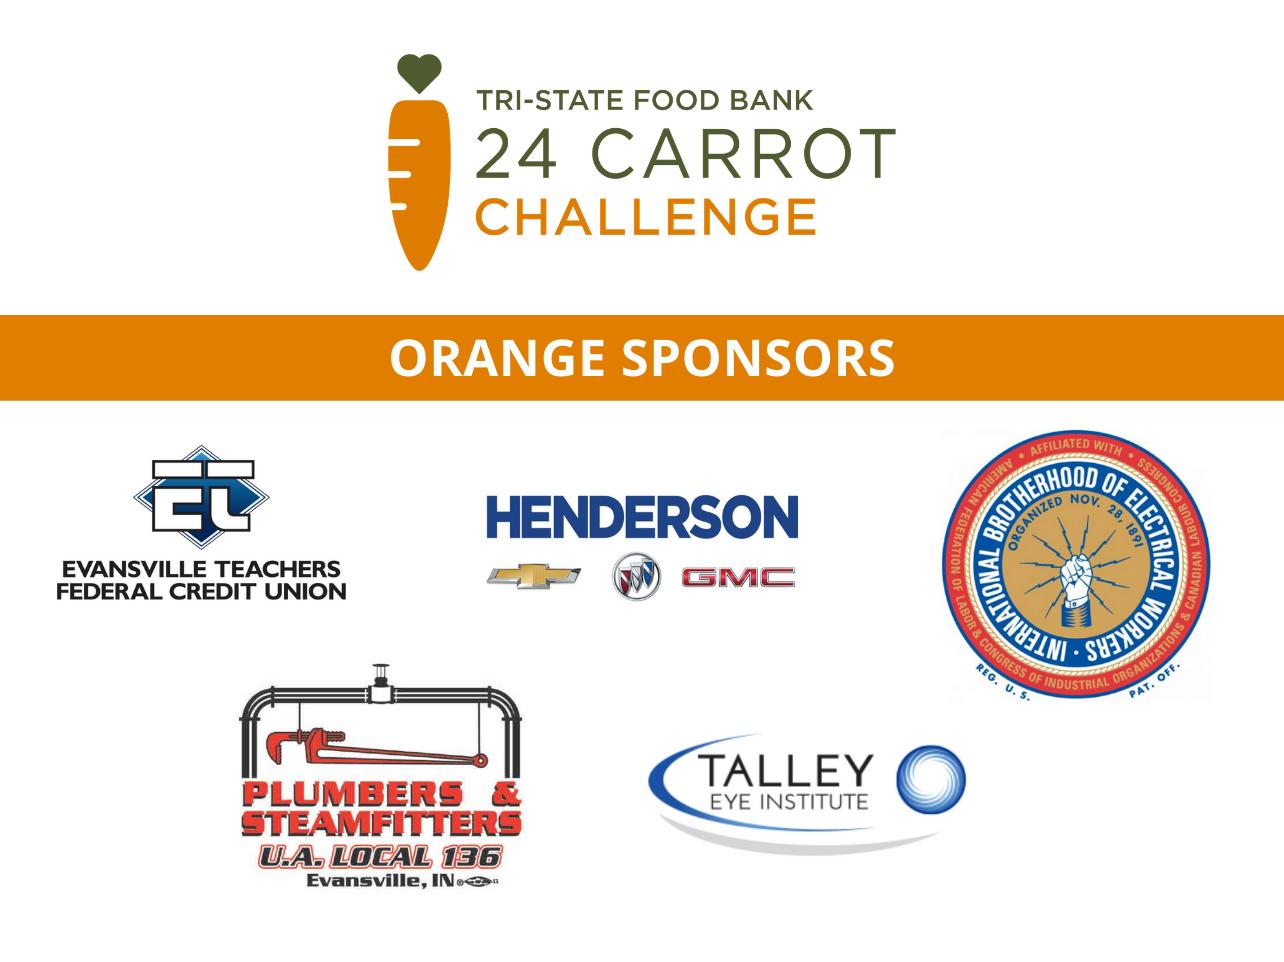 24c 2021   mobilecause carousel   orange sponsors